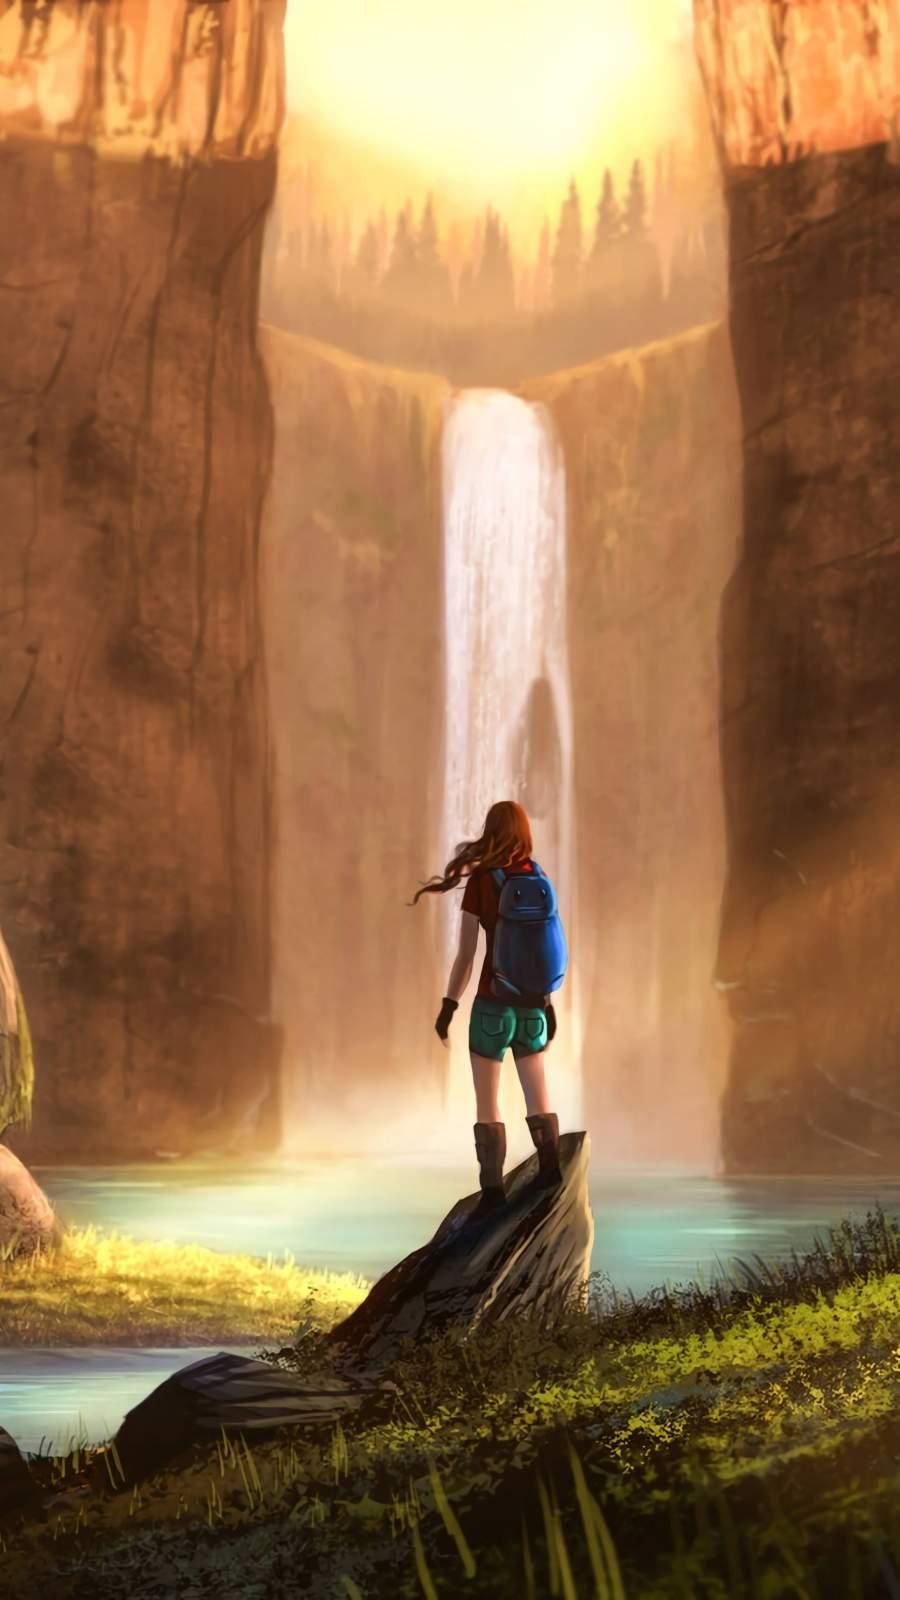 Adventure Girl Art iPhone Wallpaper